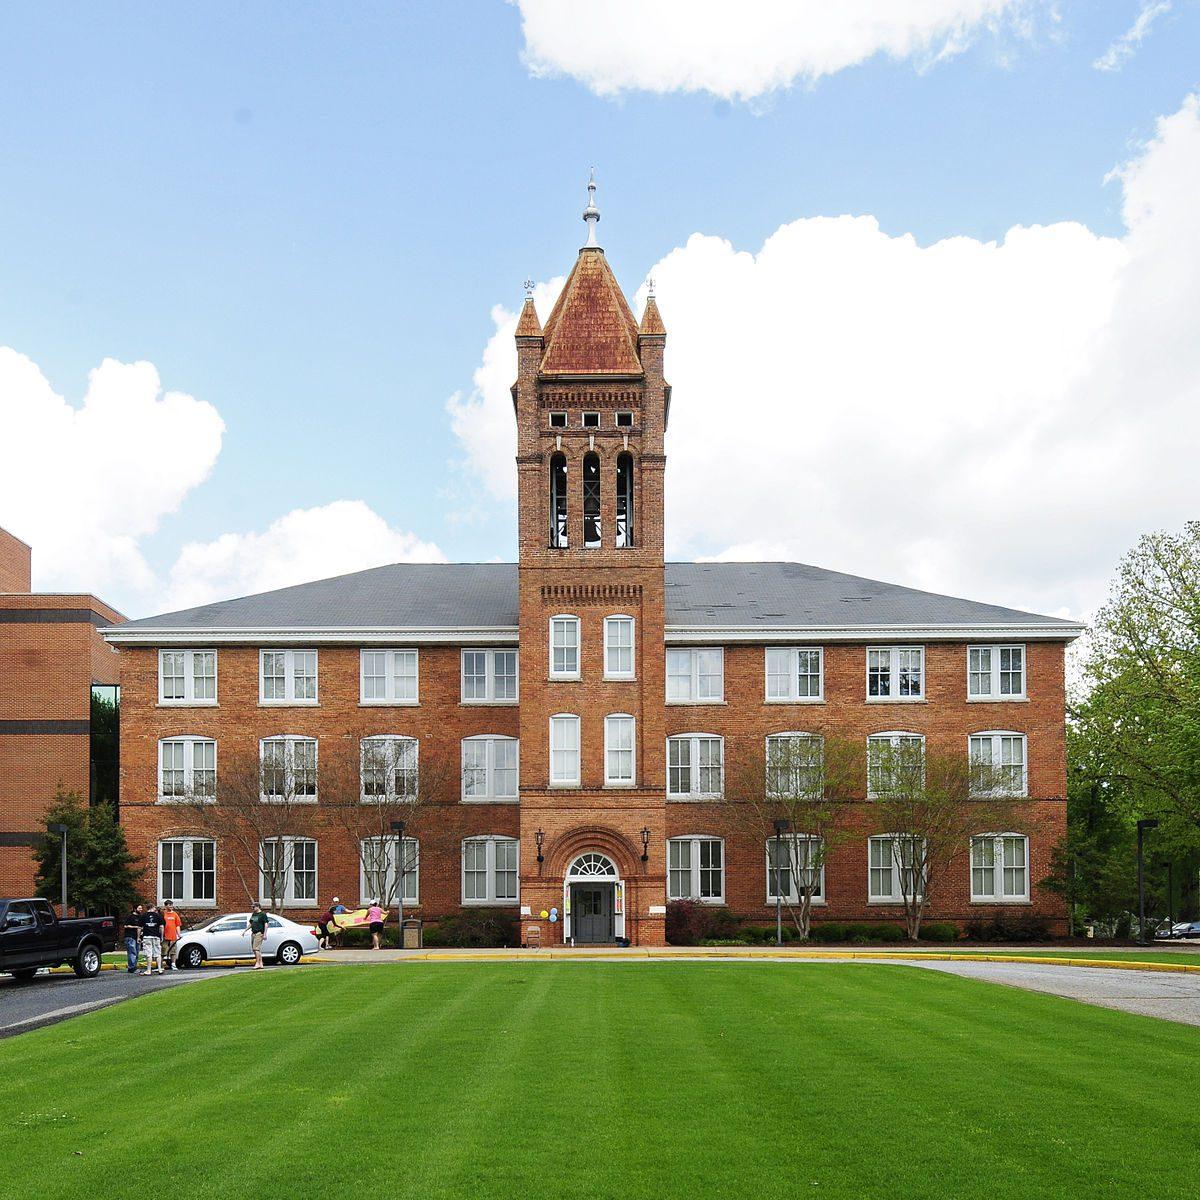 10 Easiest Classes at Lander University